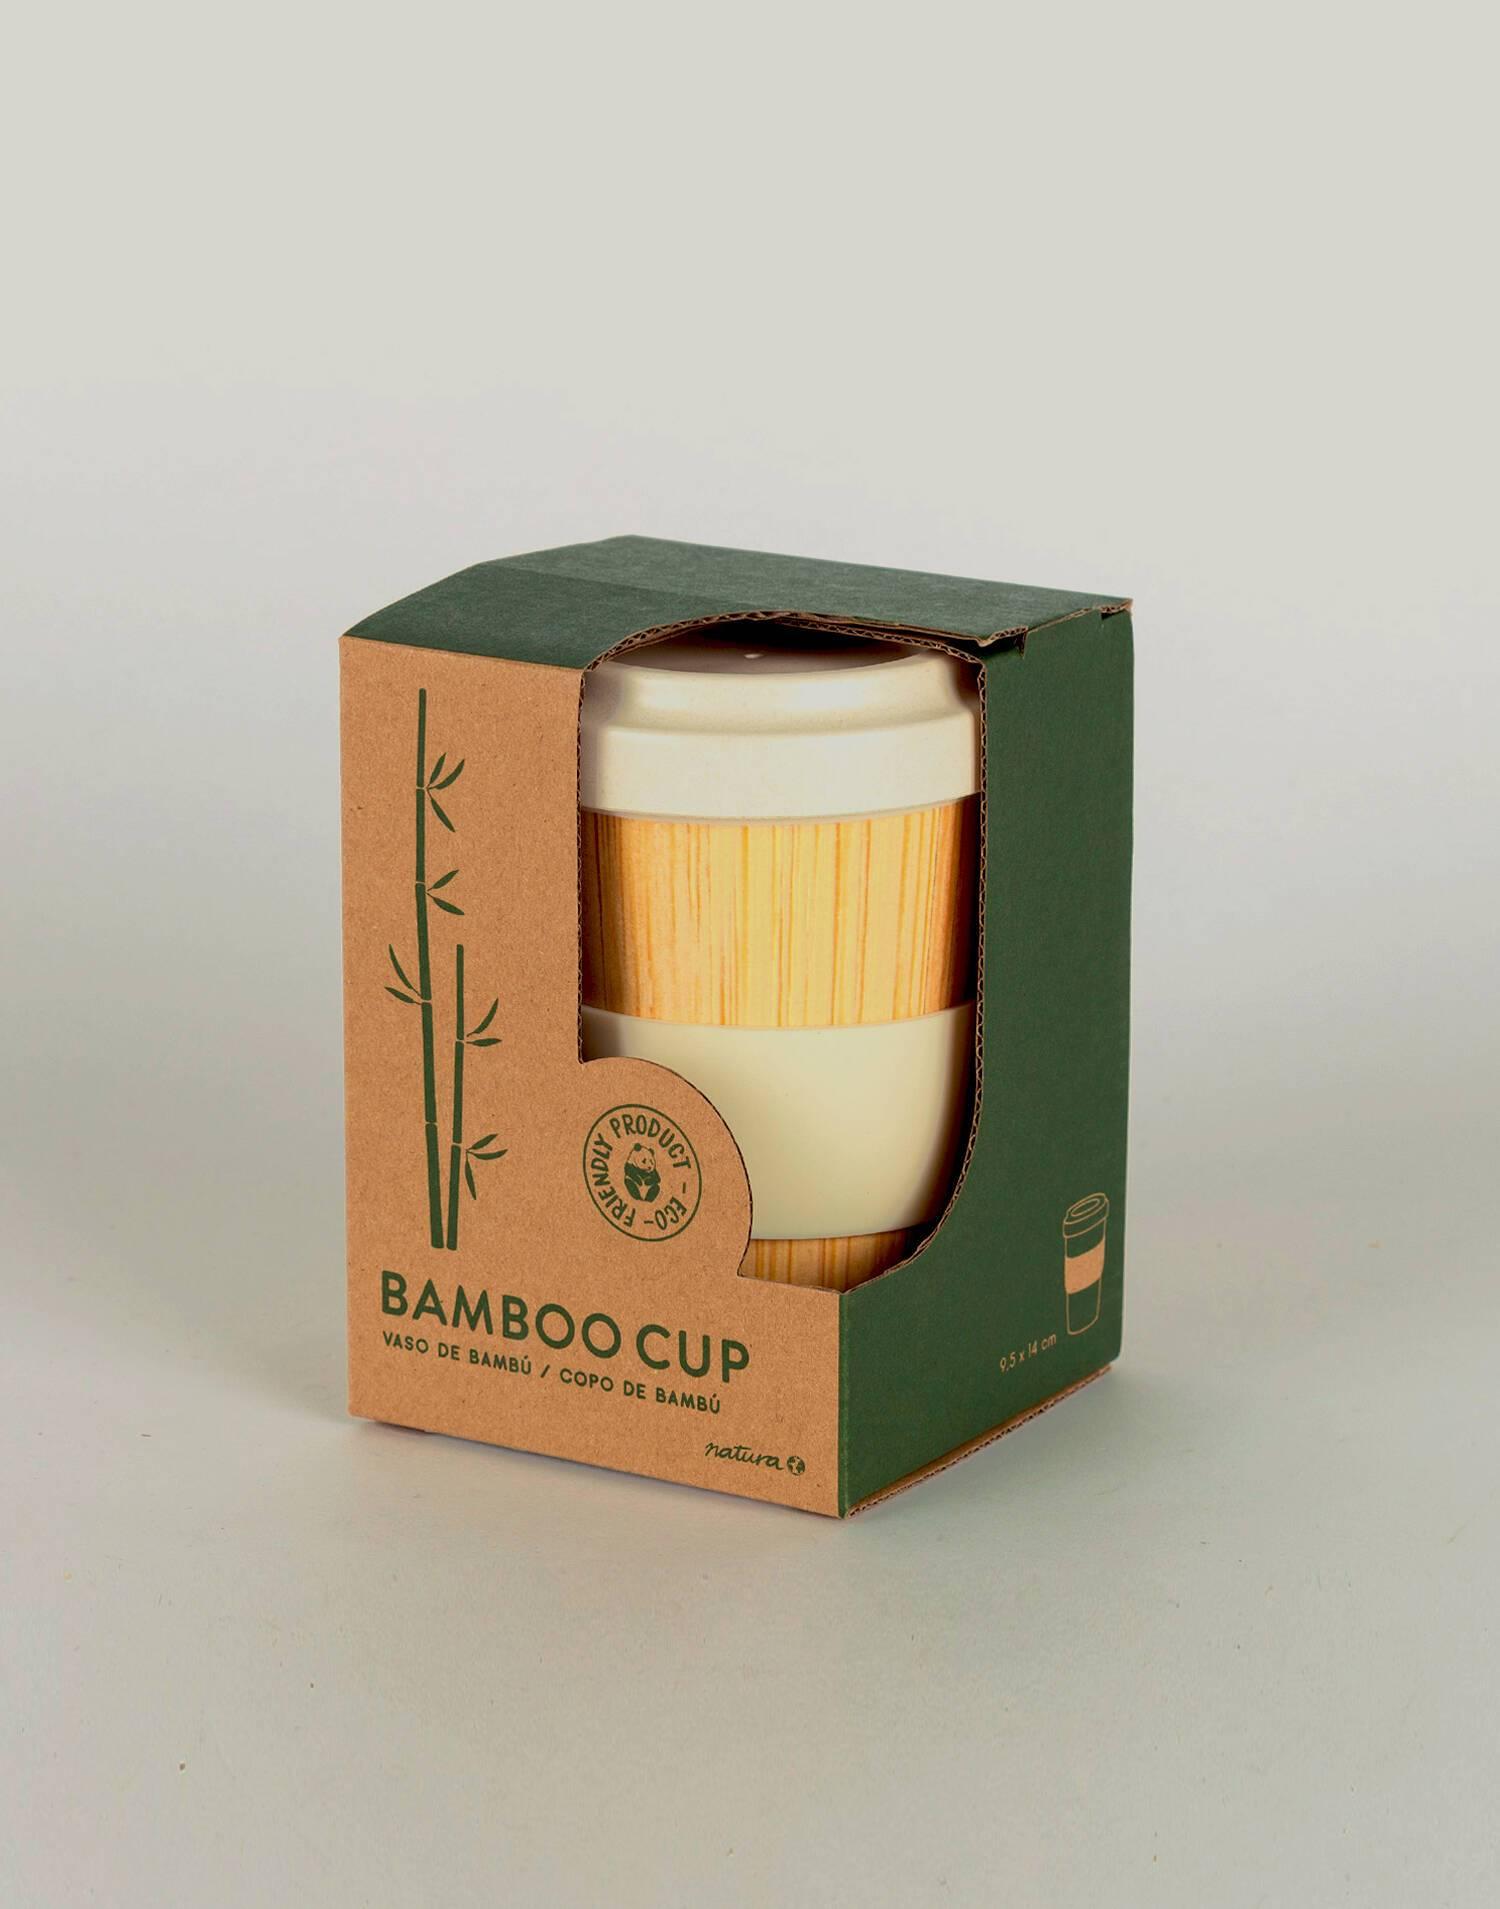 Reusable bamboo cup